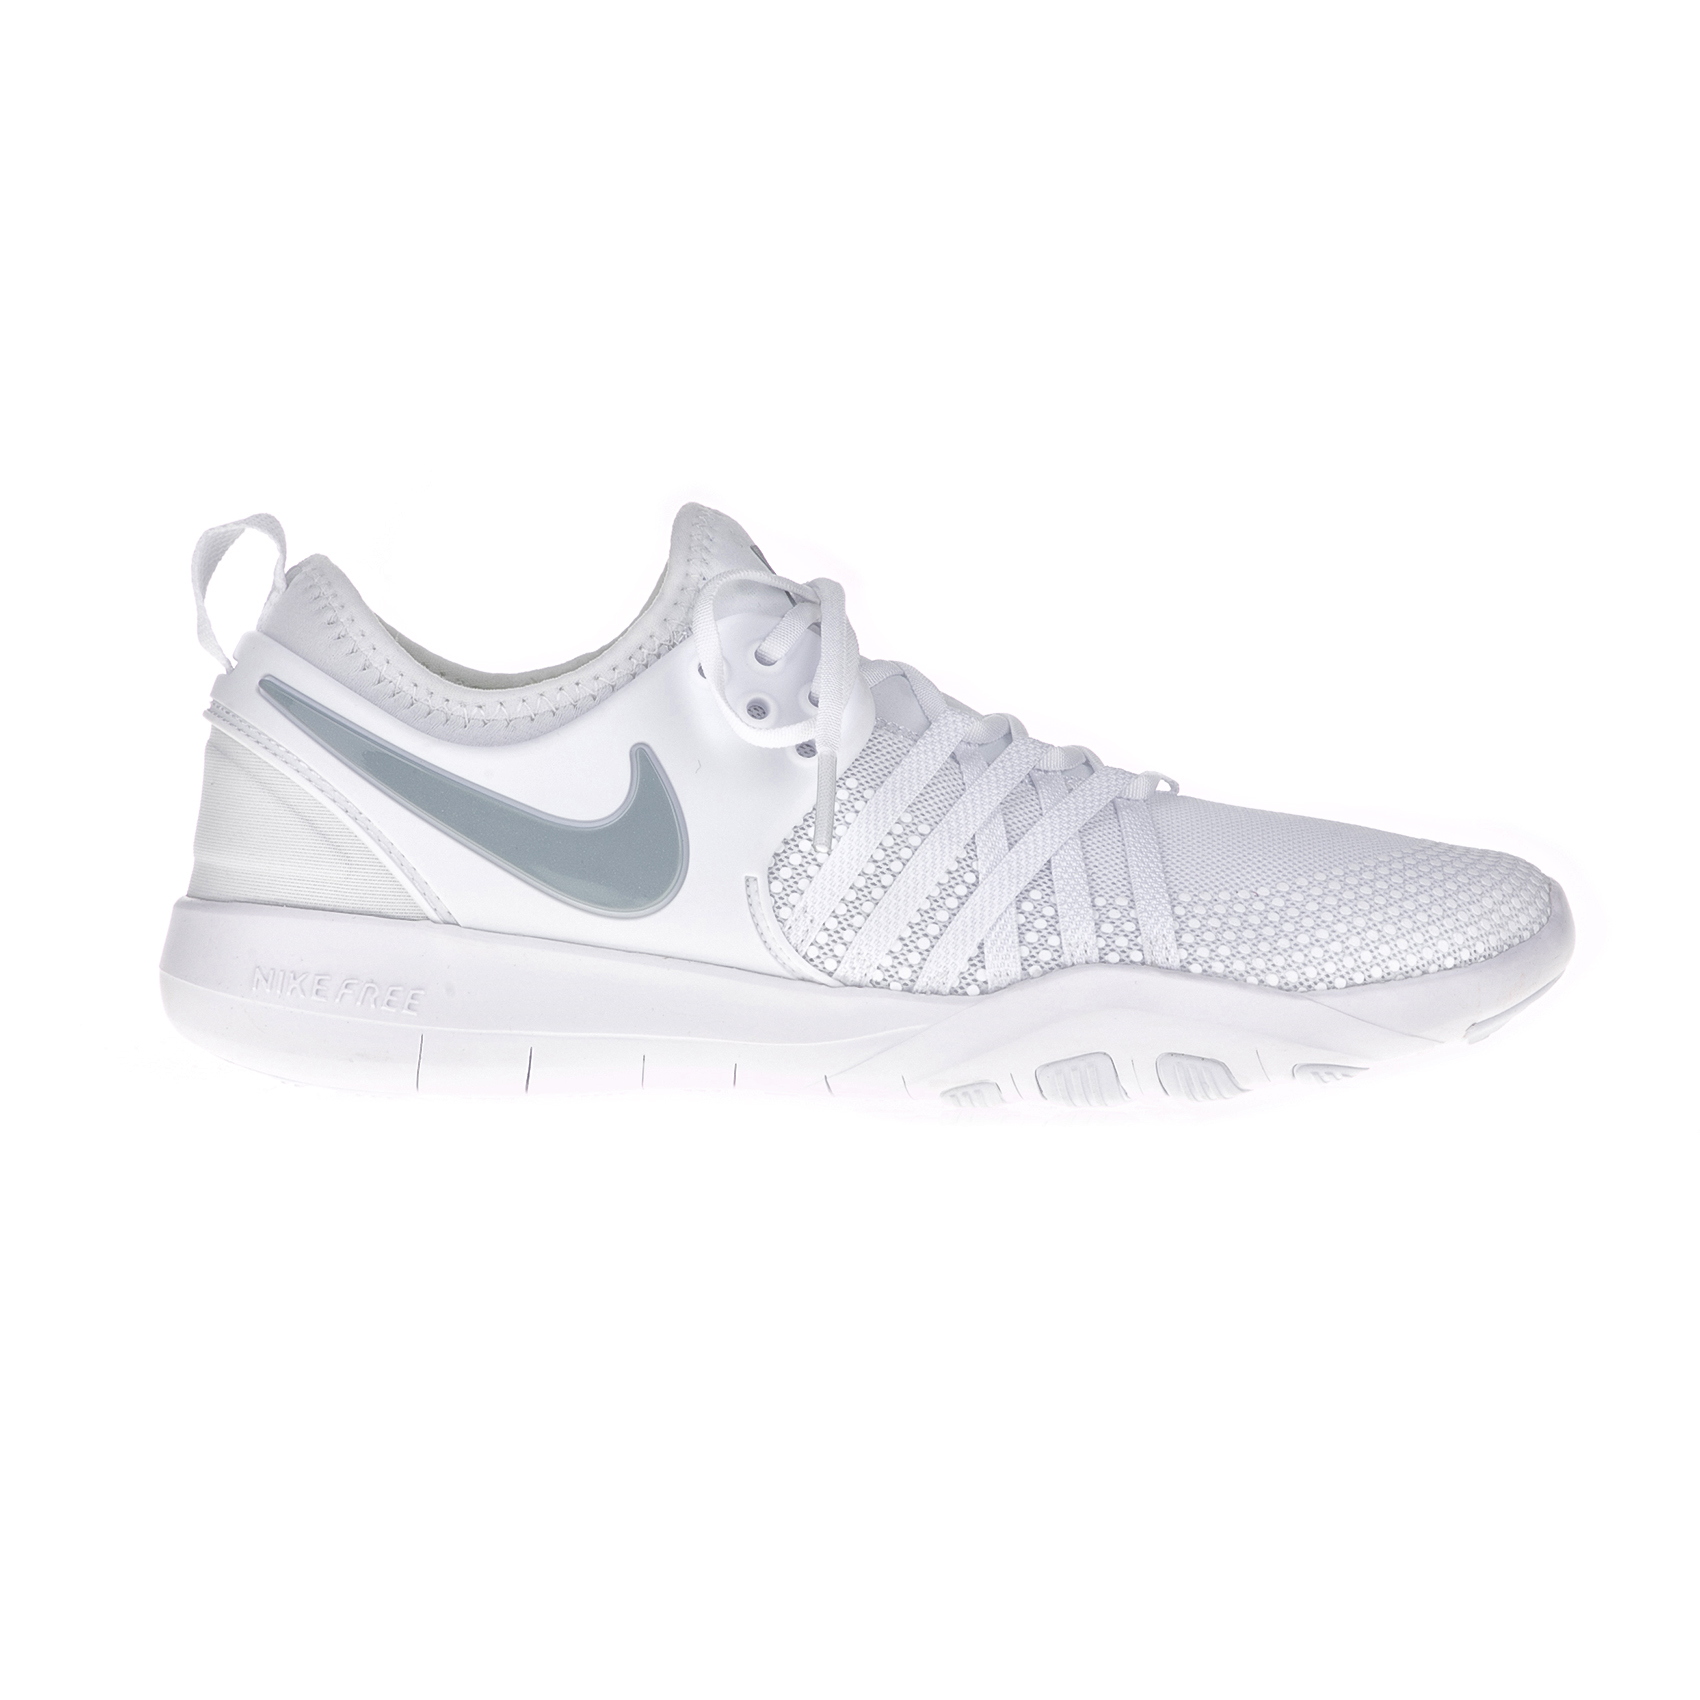 NIKE - Γυναικεία αθλητικά παπούτσια NIKE FREE TR 7 λευκά